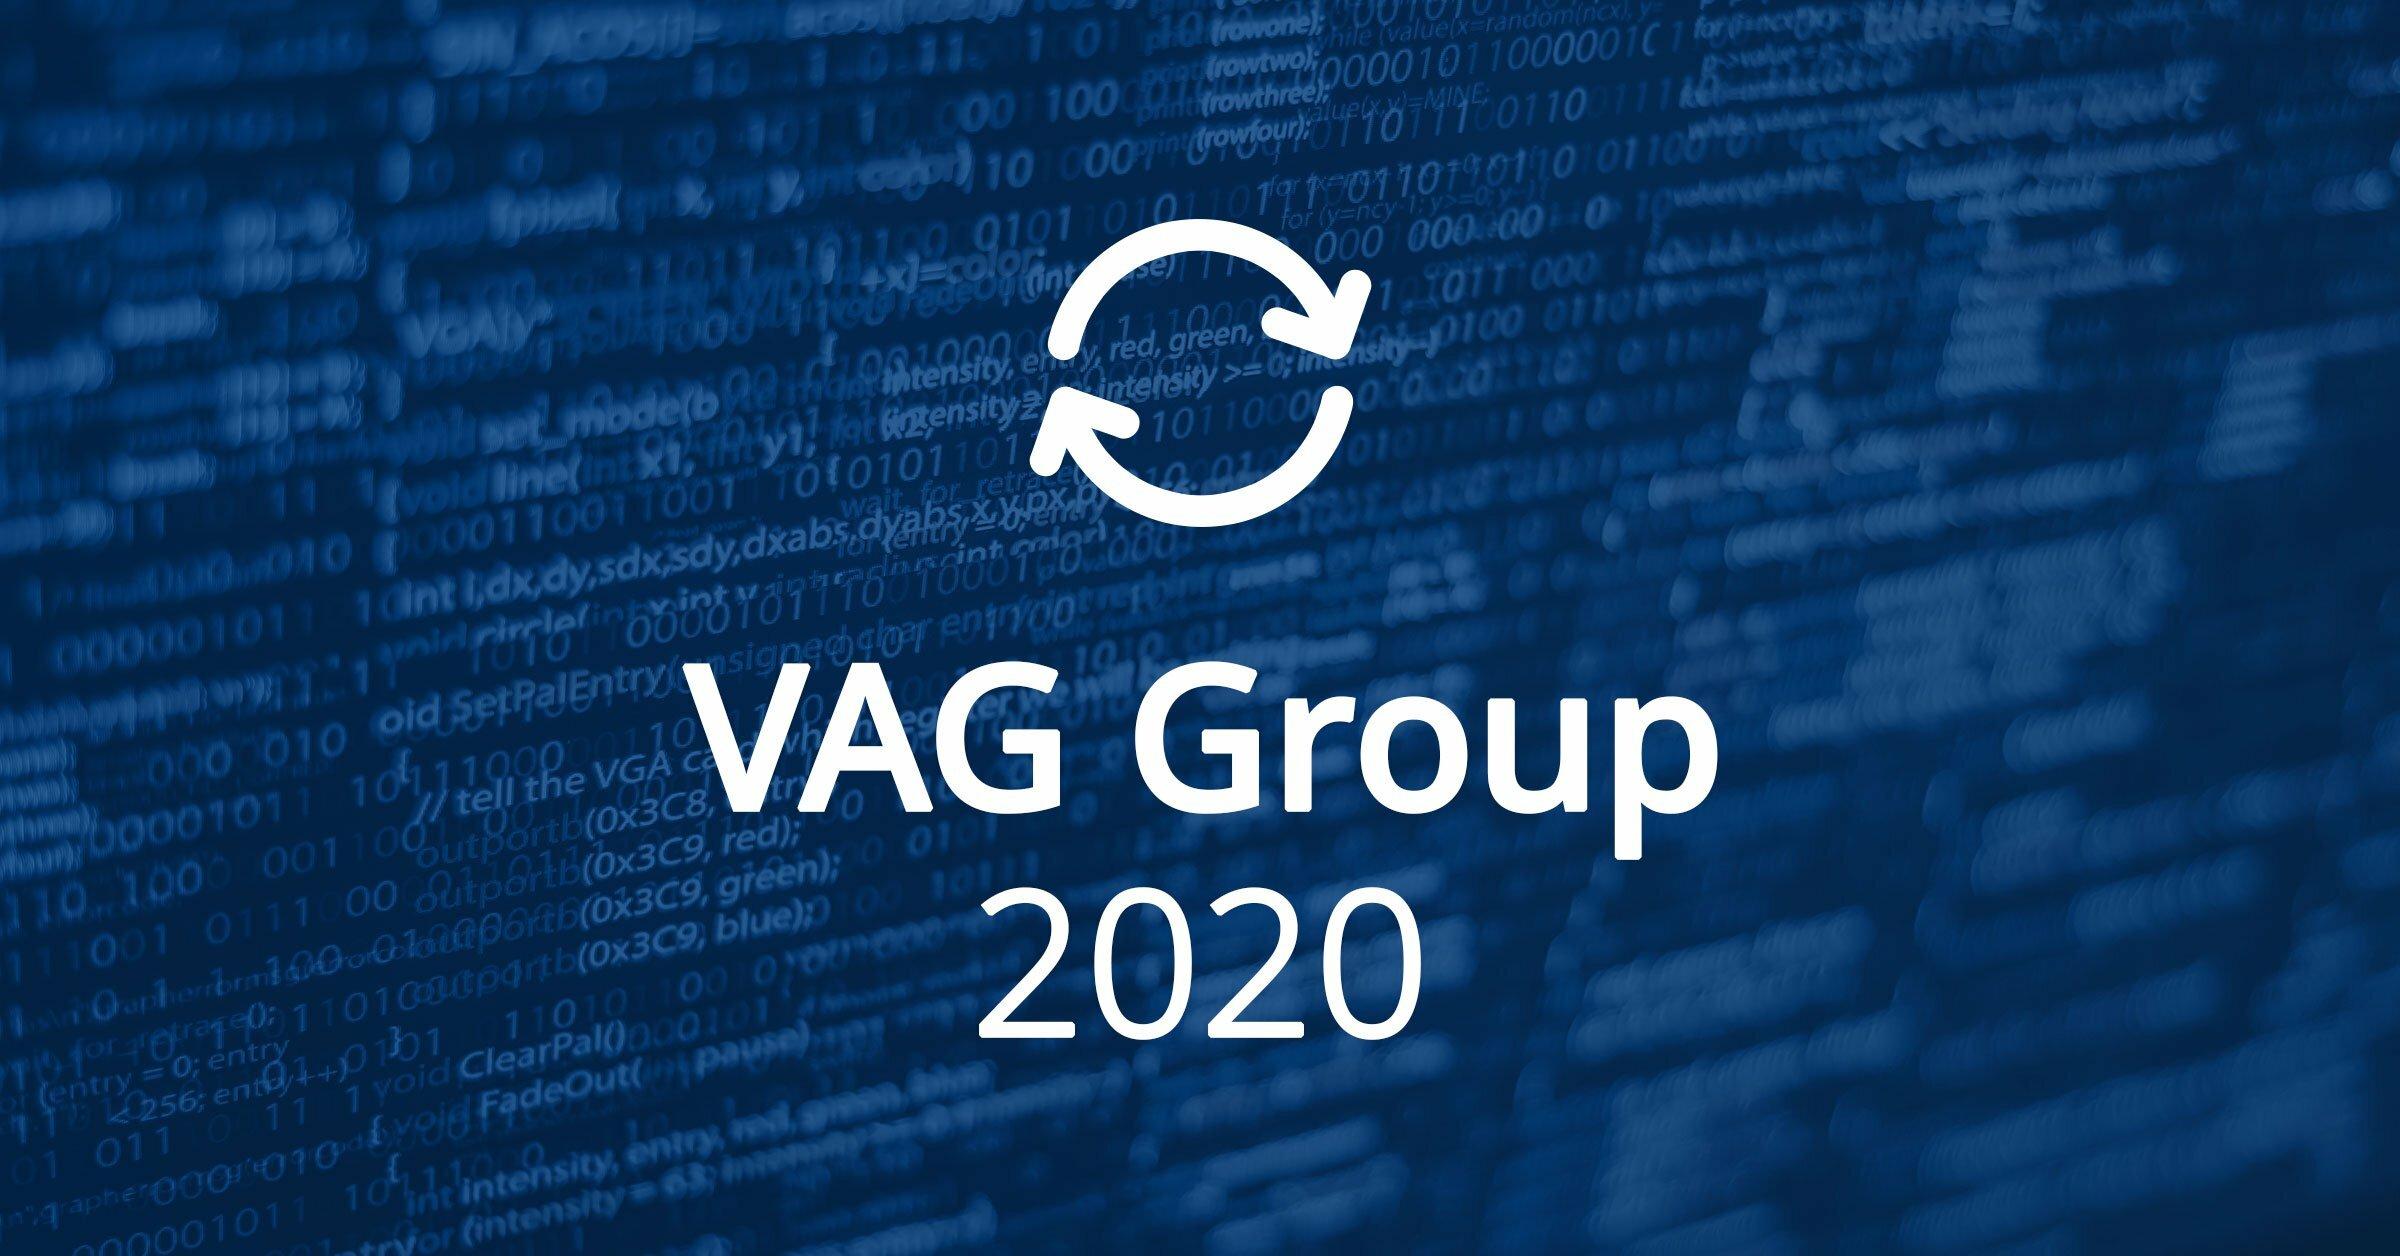 VAG Group Software Updates 2020